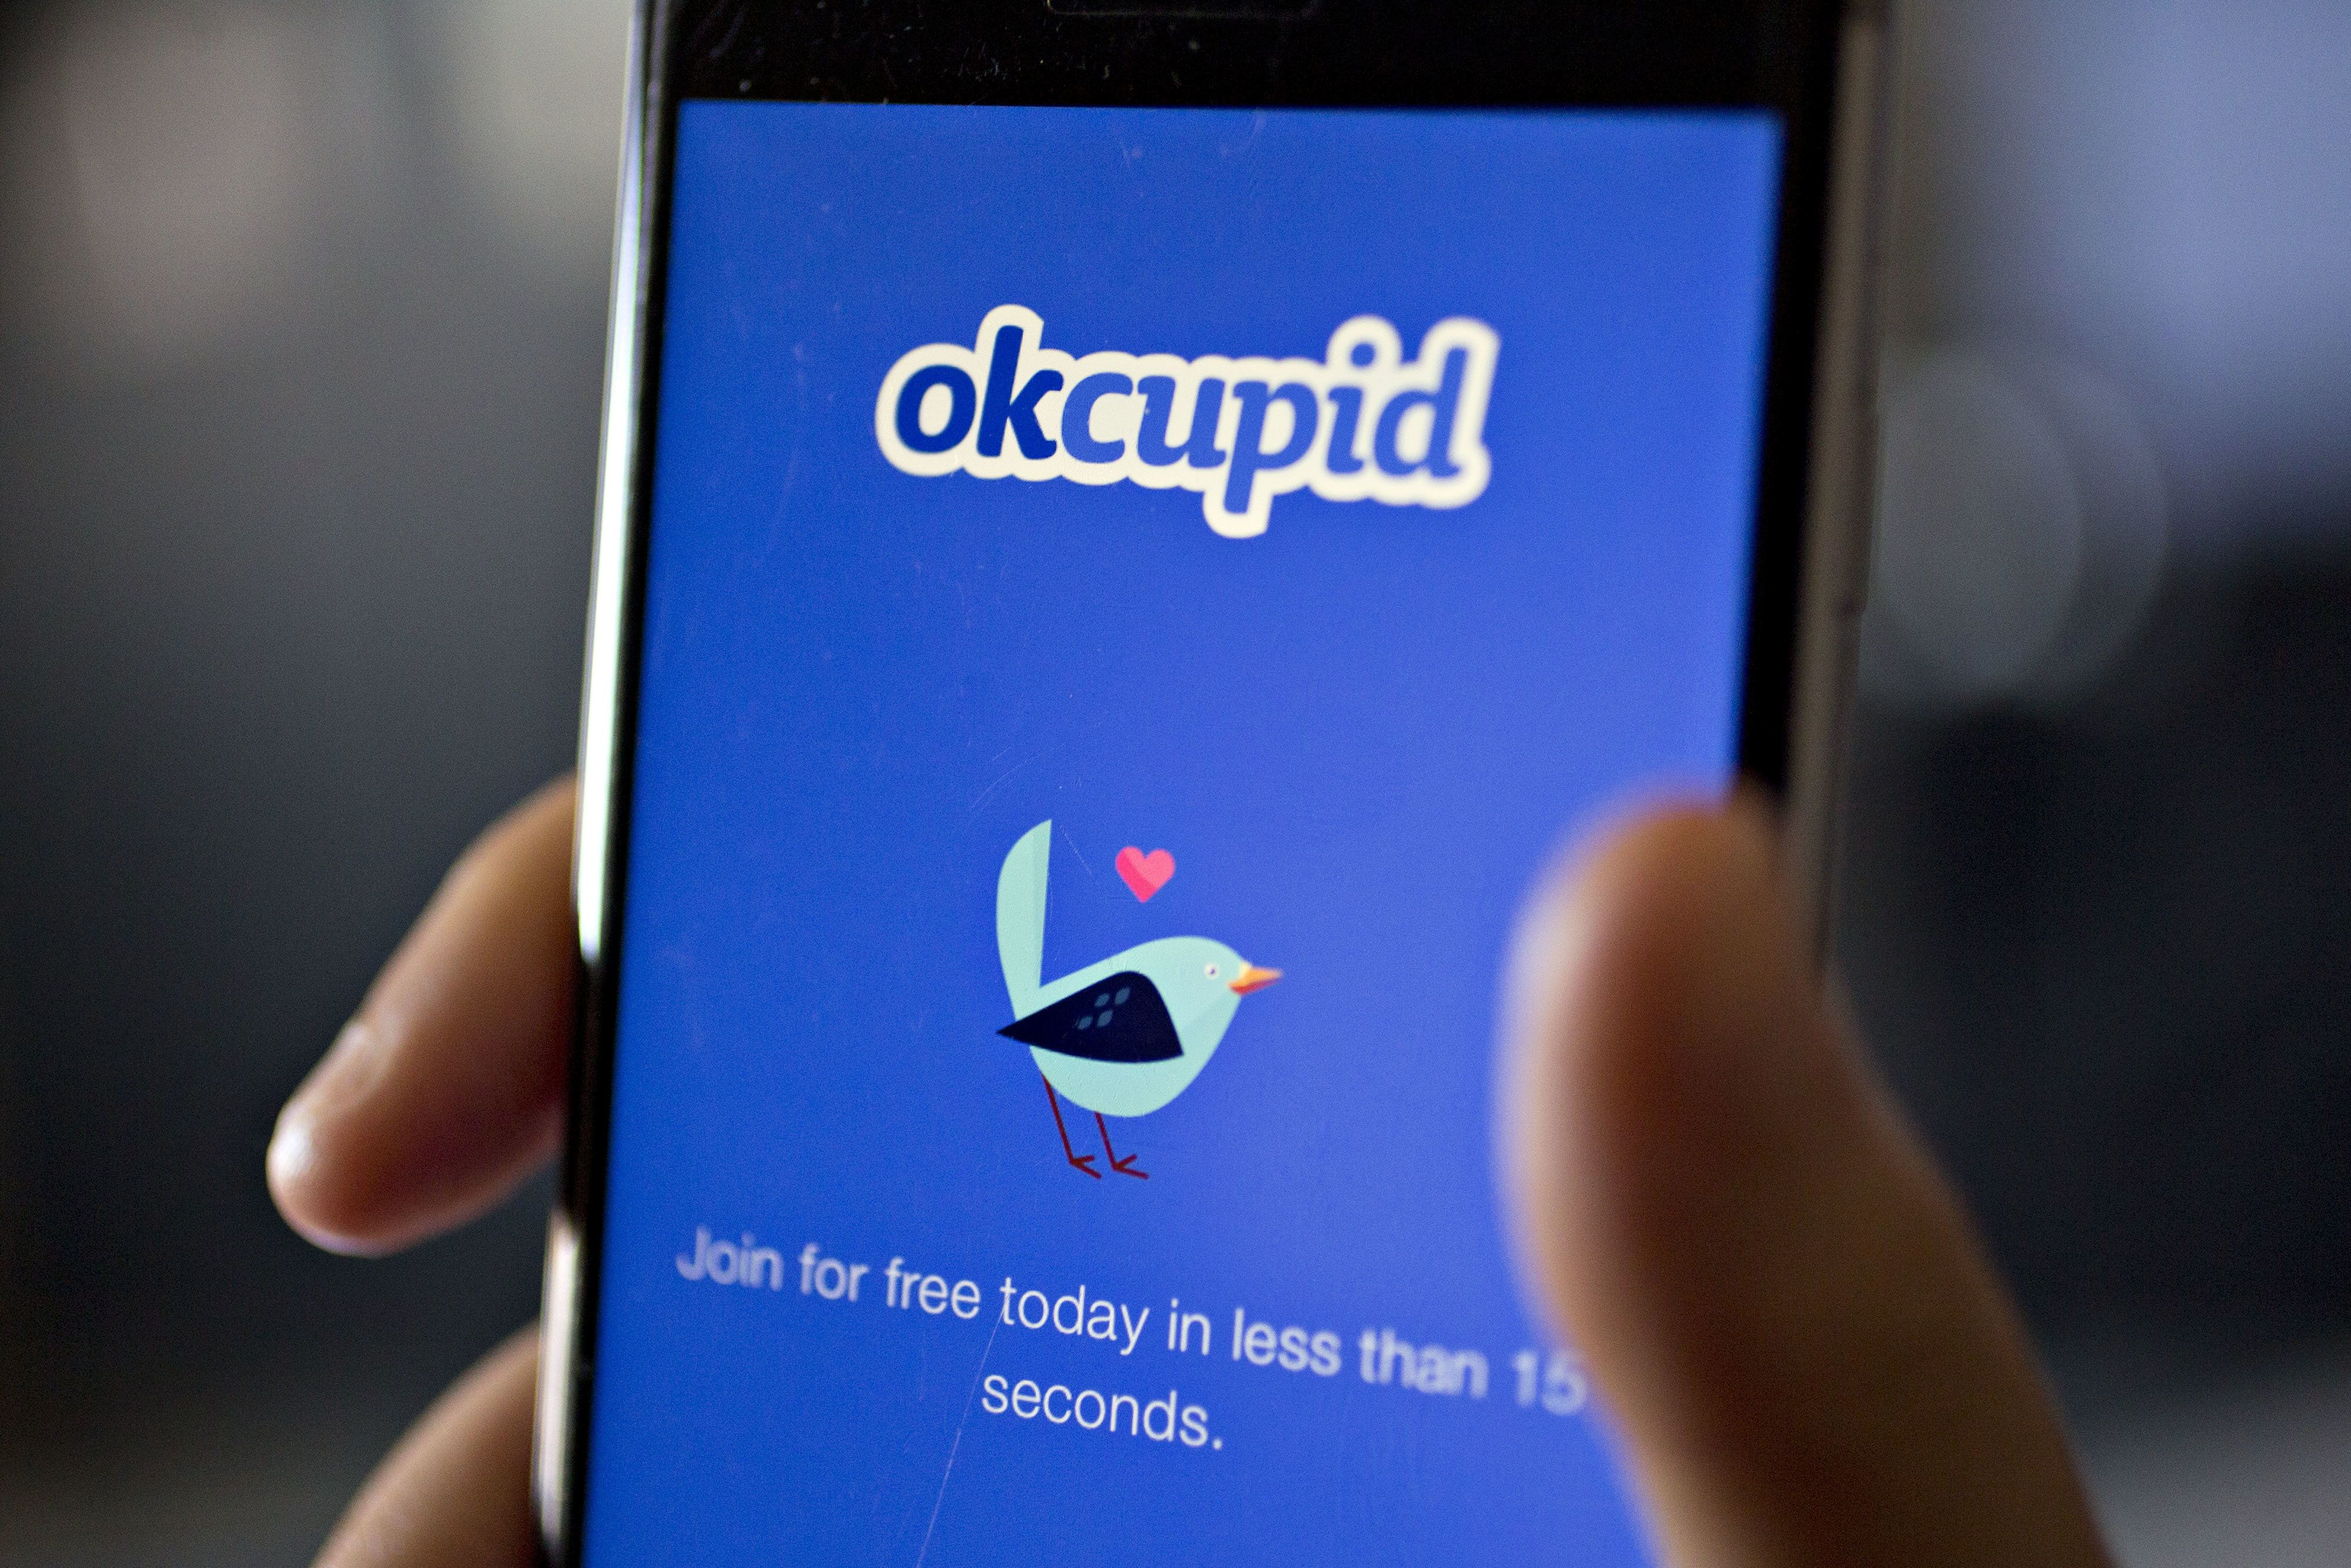 Less love driven okcupid dating